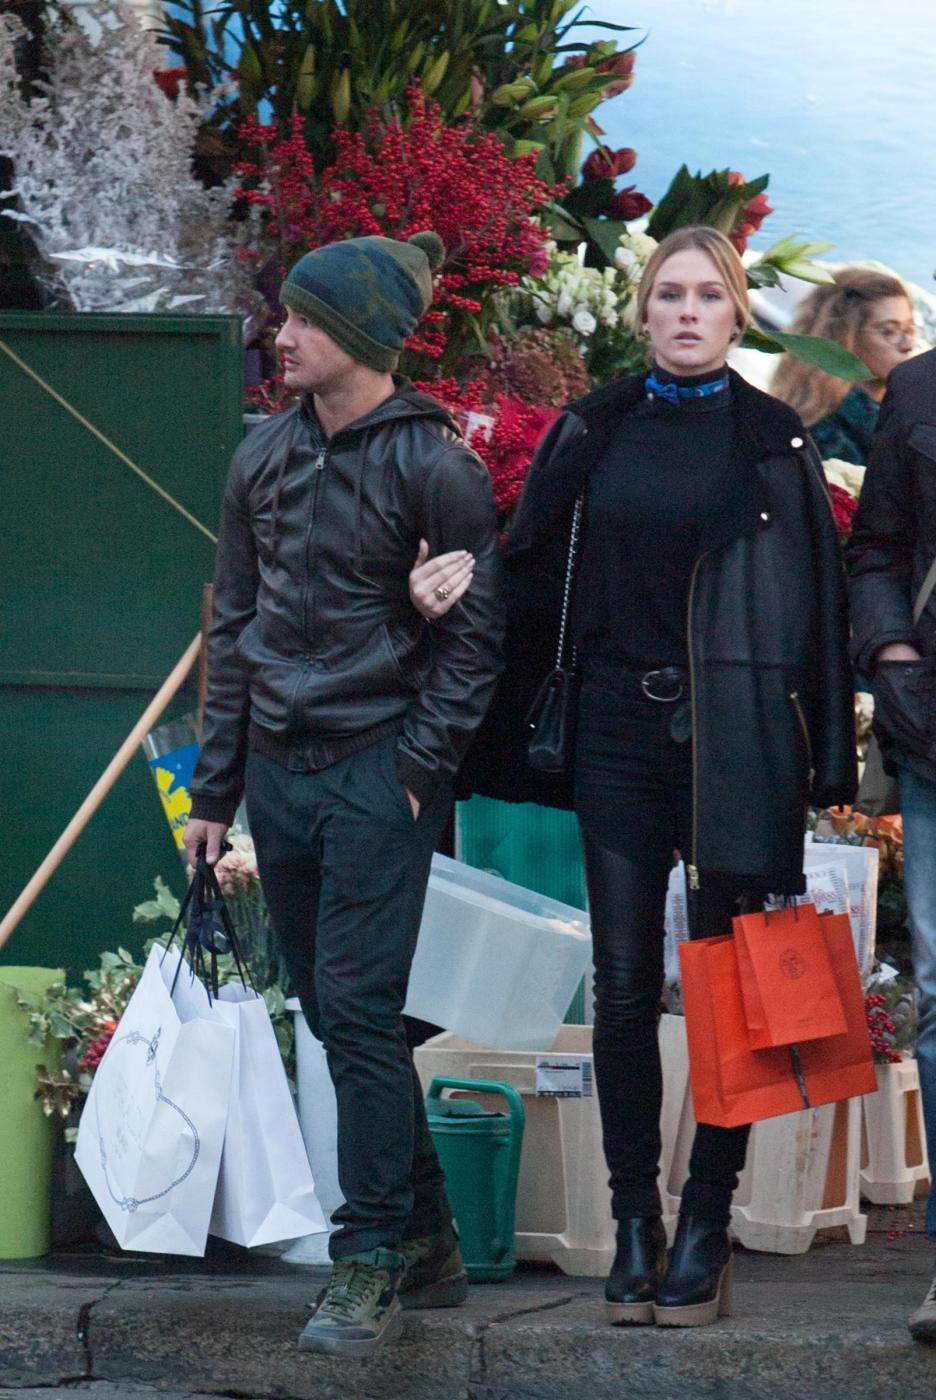 Pato, shopping a Milano con fidanzata Fiorella Mattheis5